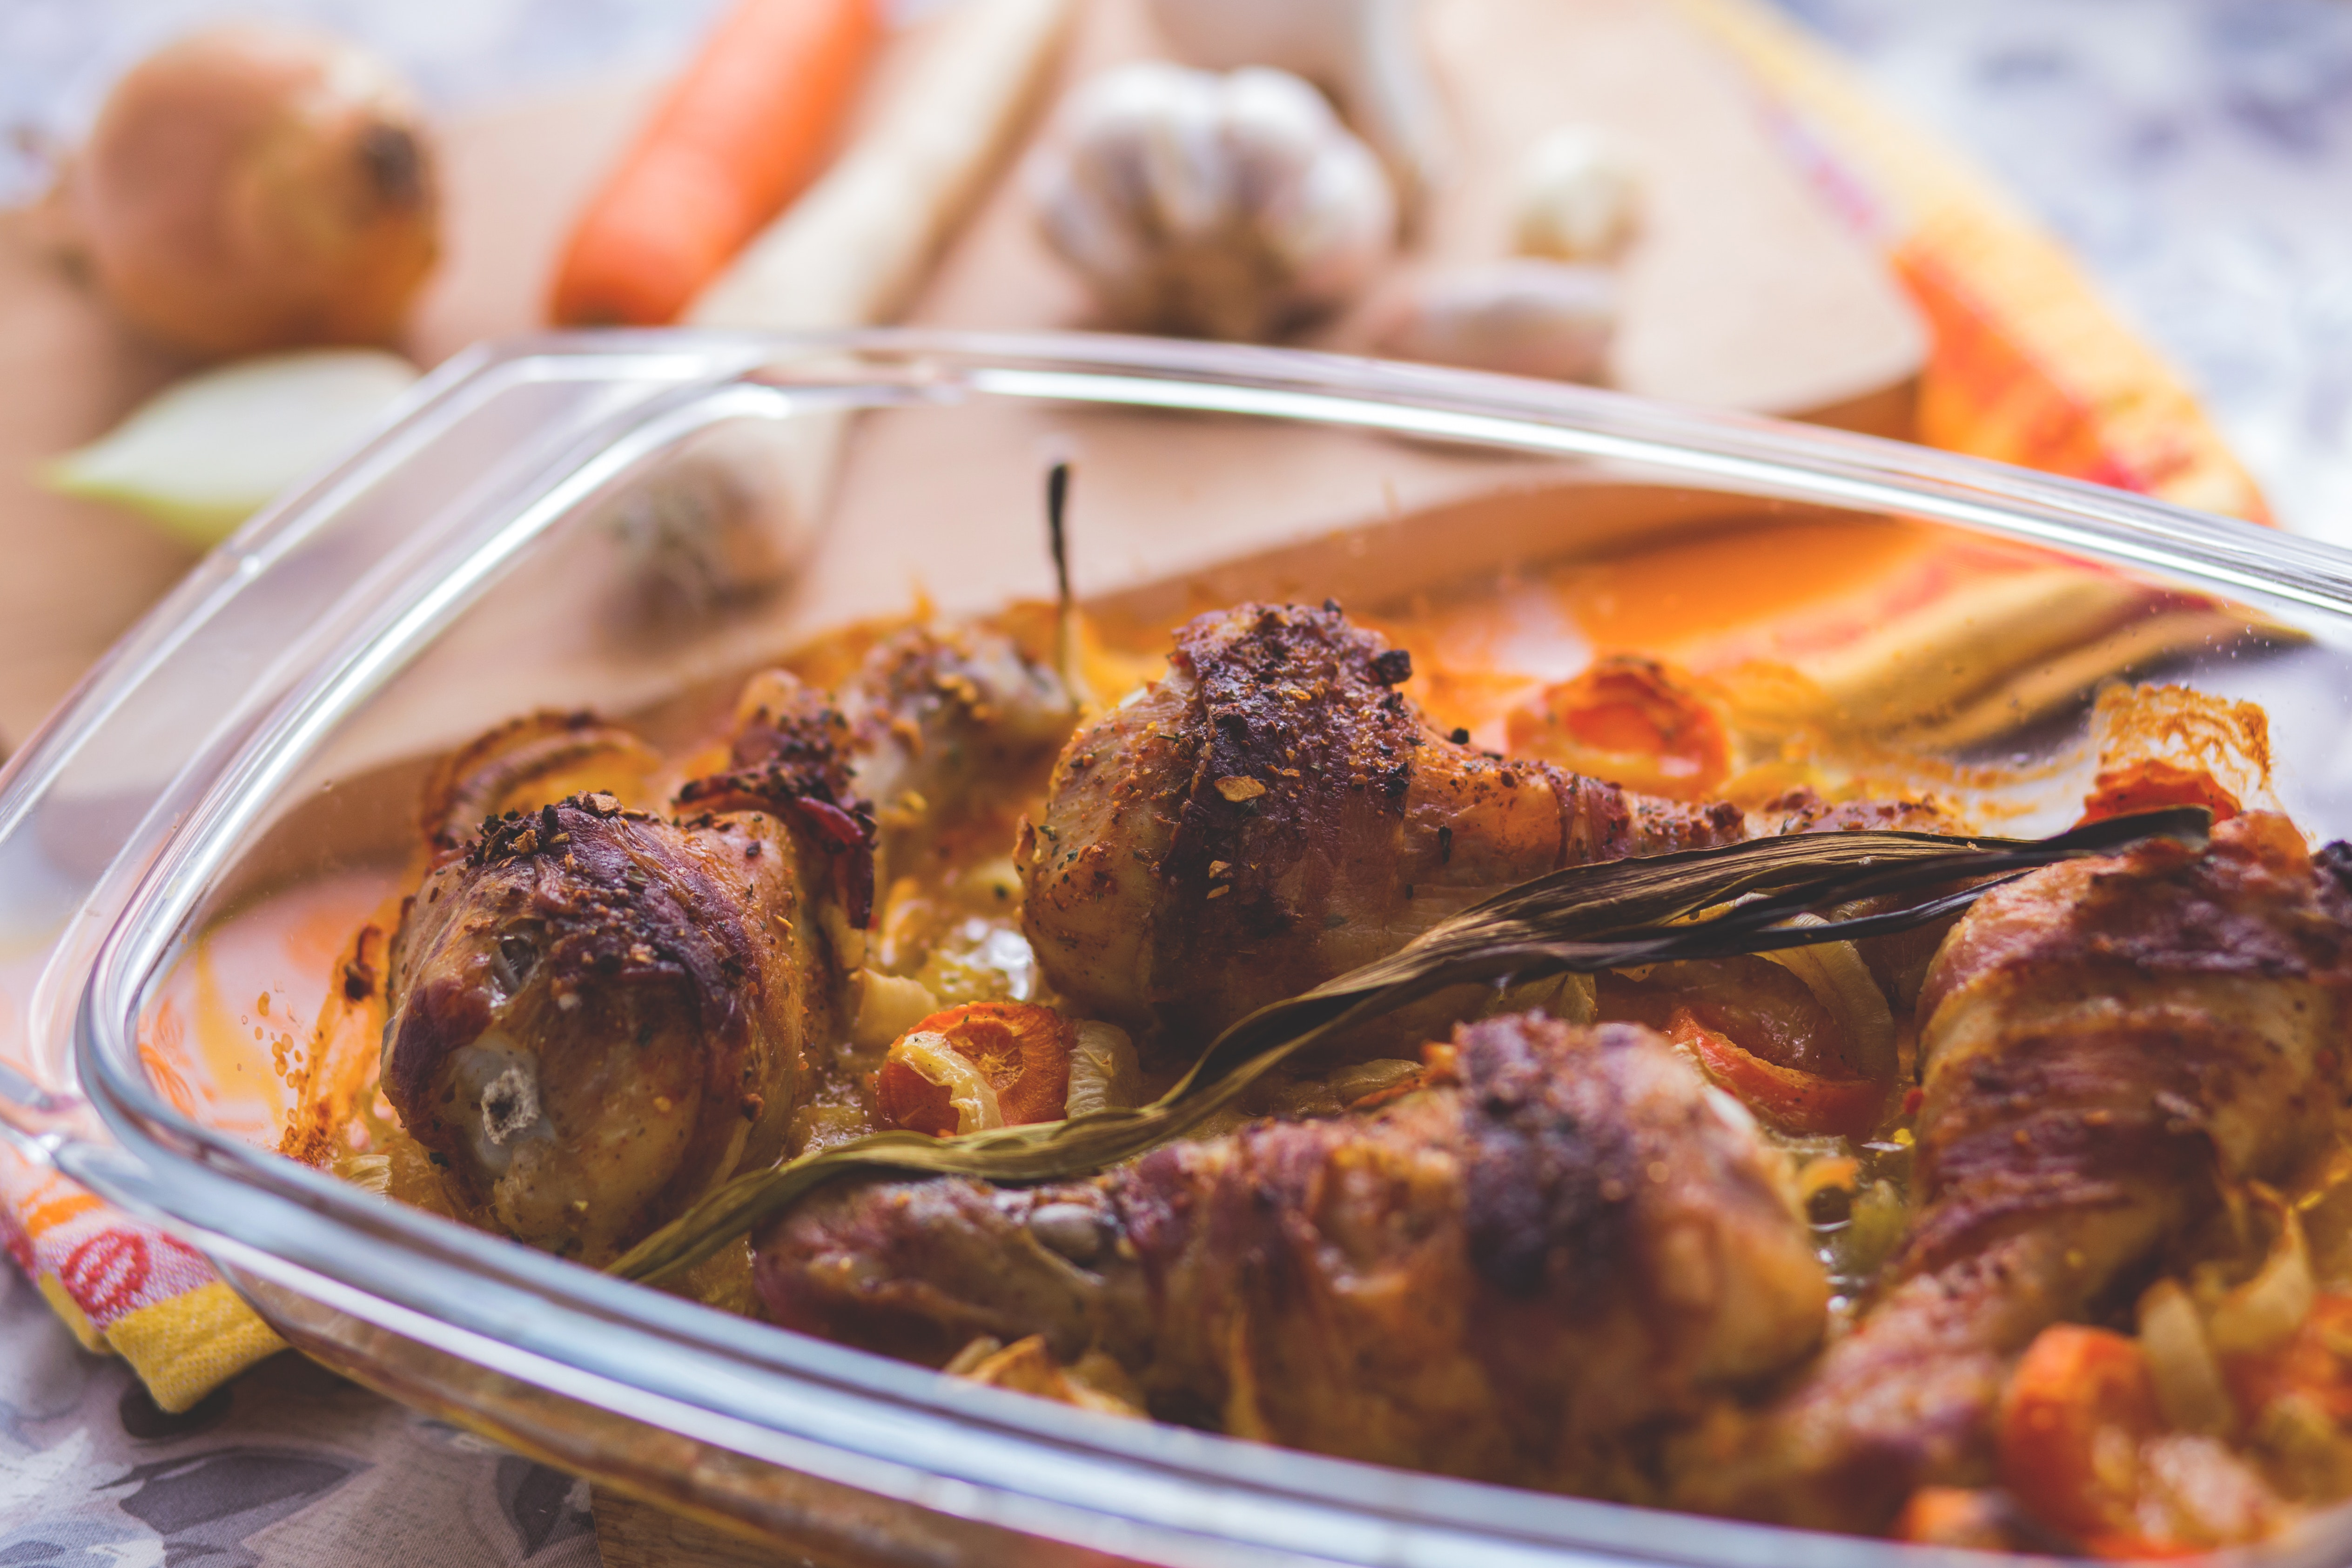 receta de alitas de pollo confitadas por martín berasategui